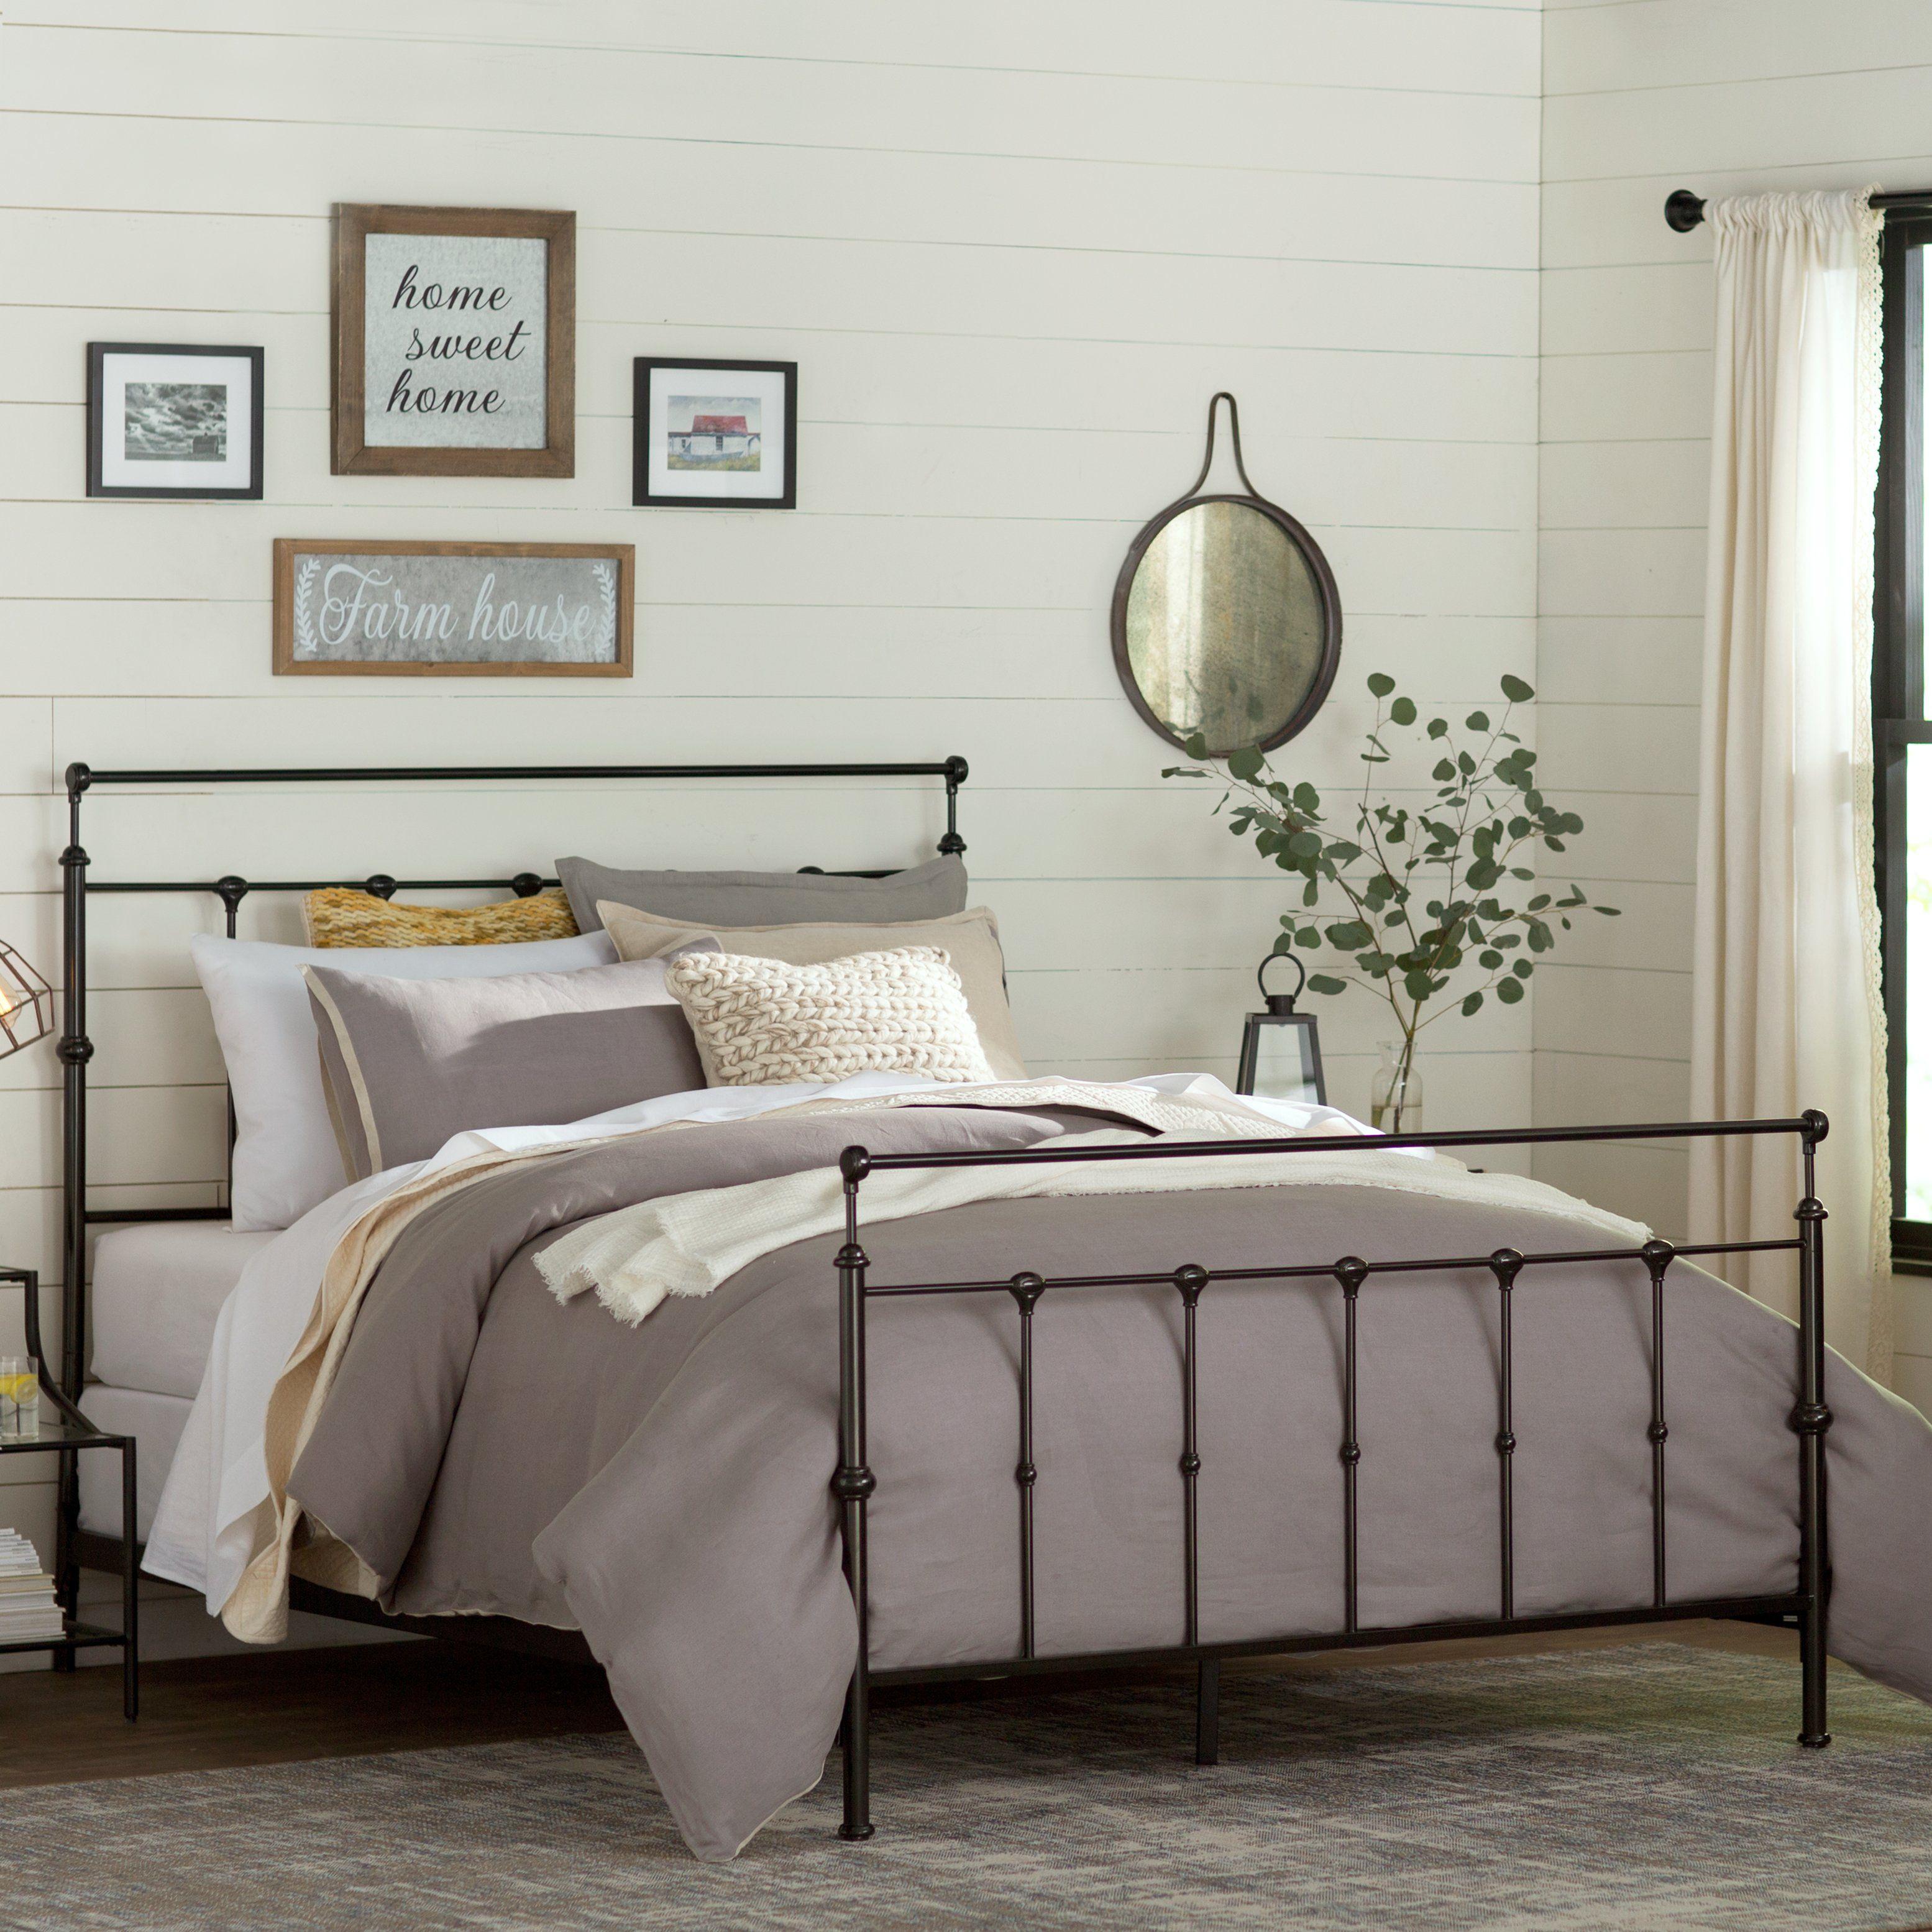 Gloucester Upholstered Standard Bed Country bedroom